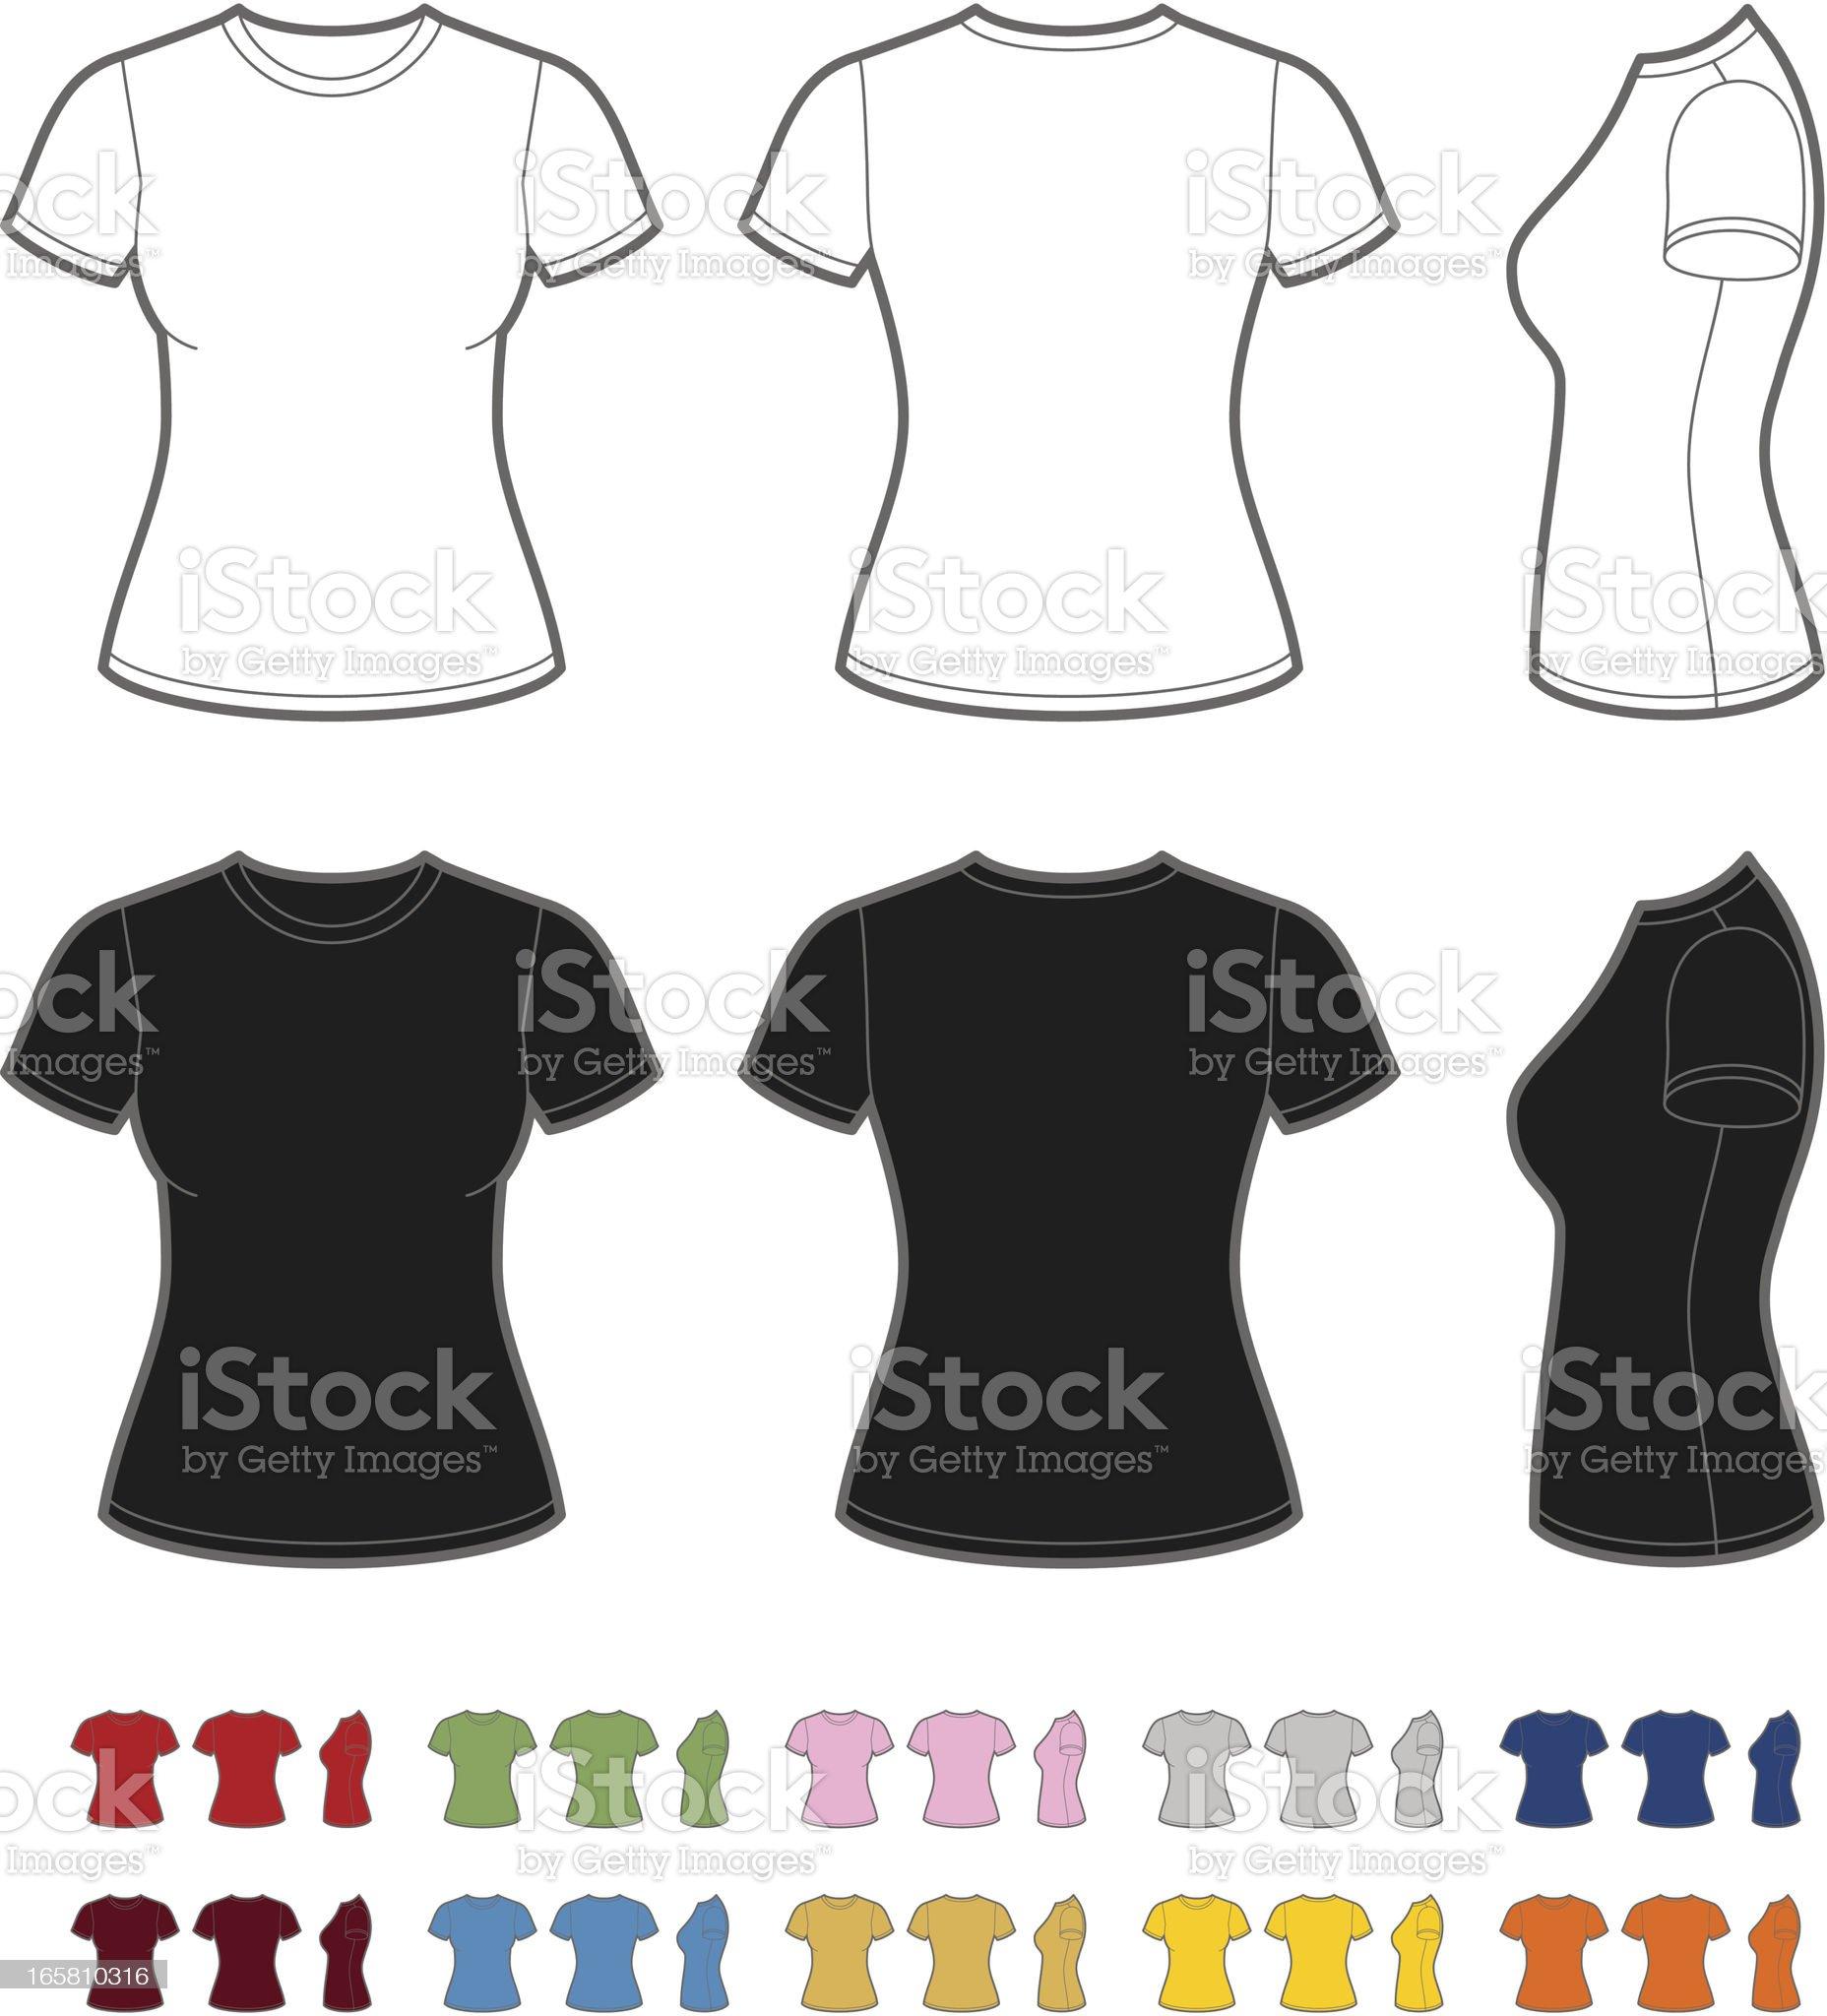 Women's t-shirt royalty-free stock vector art